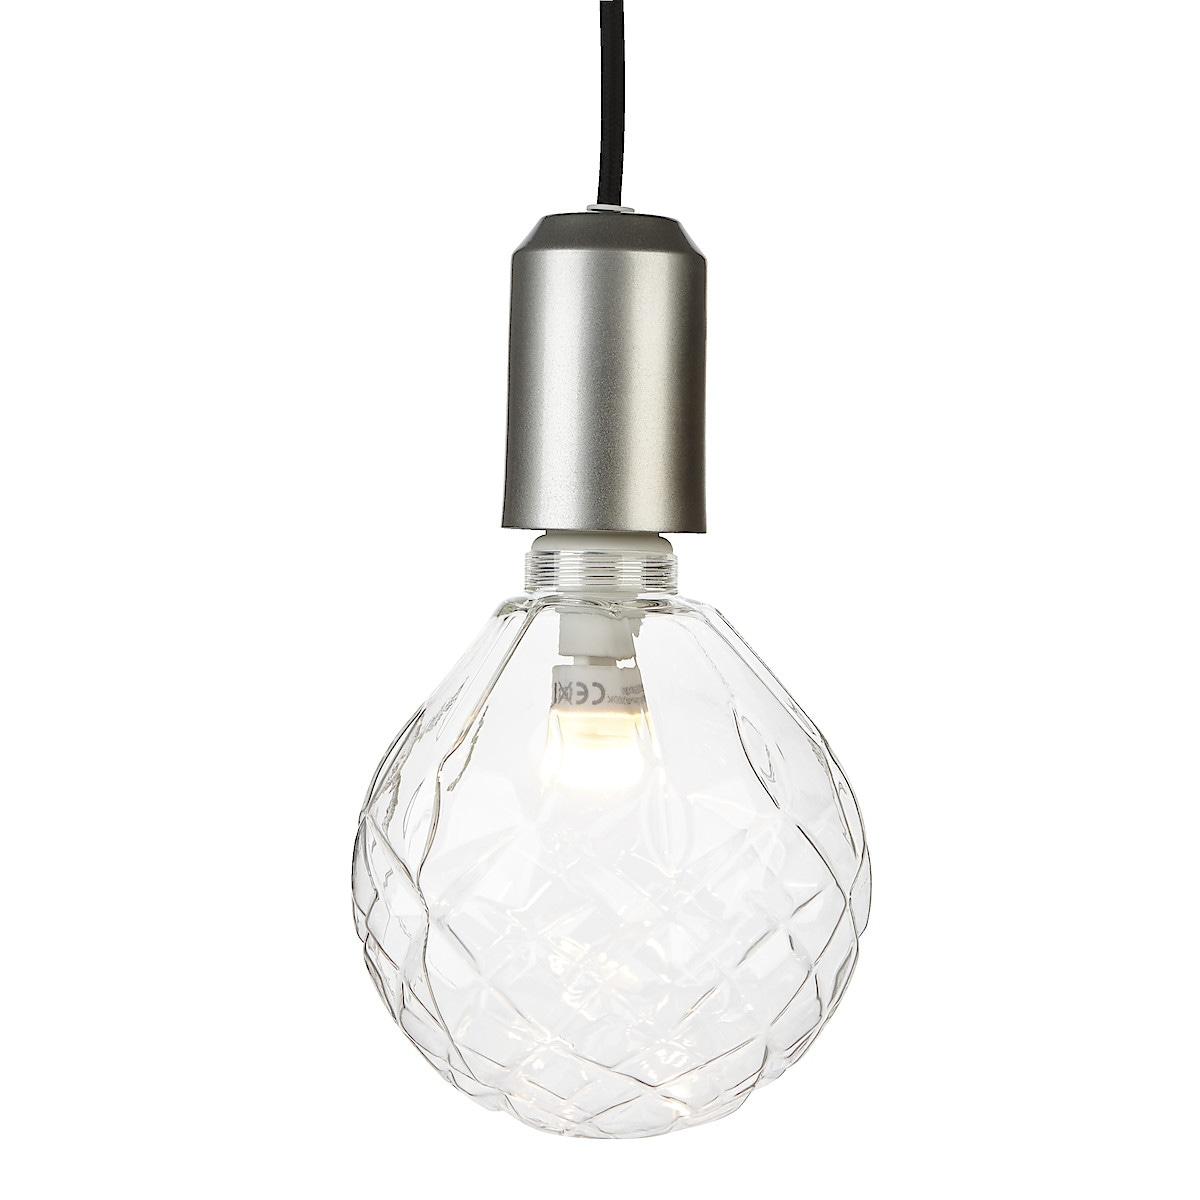 Design-lamppu